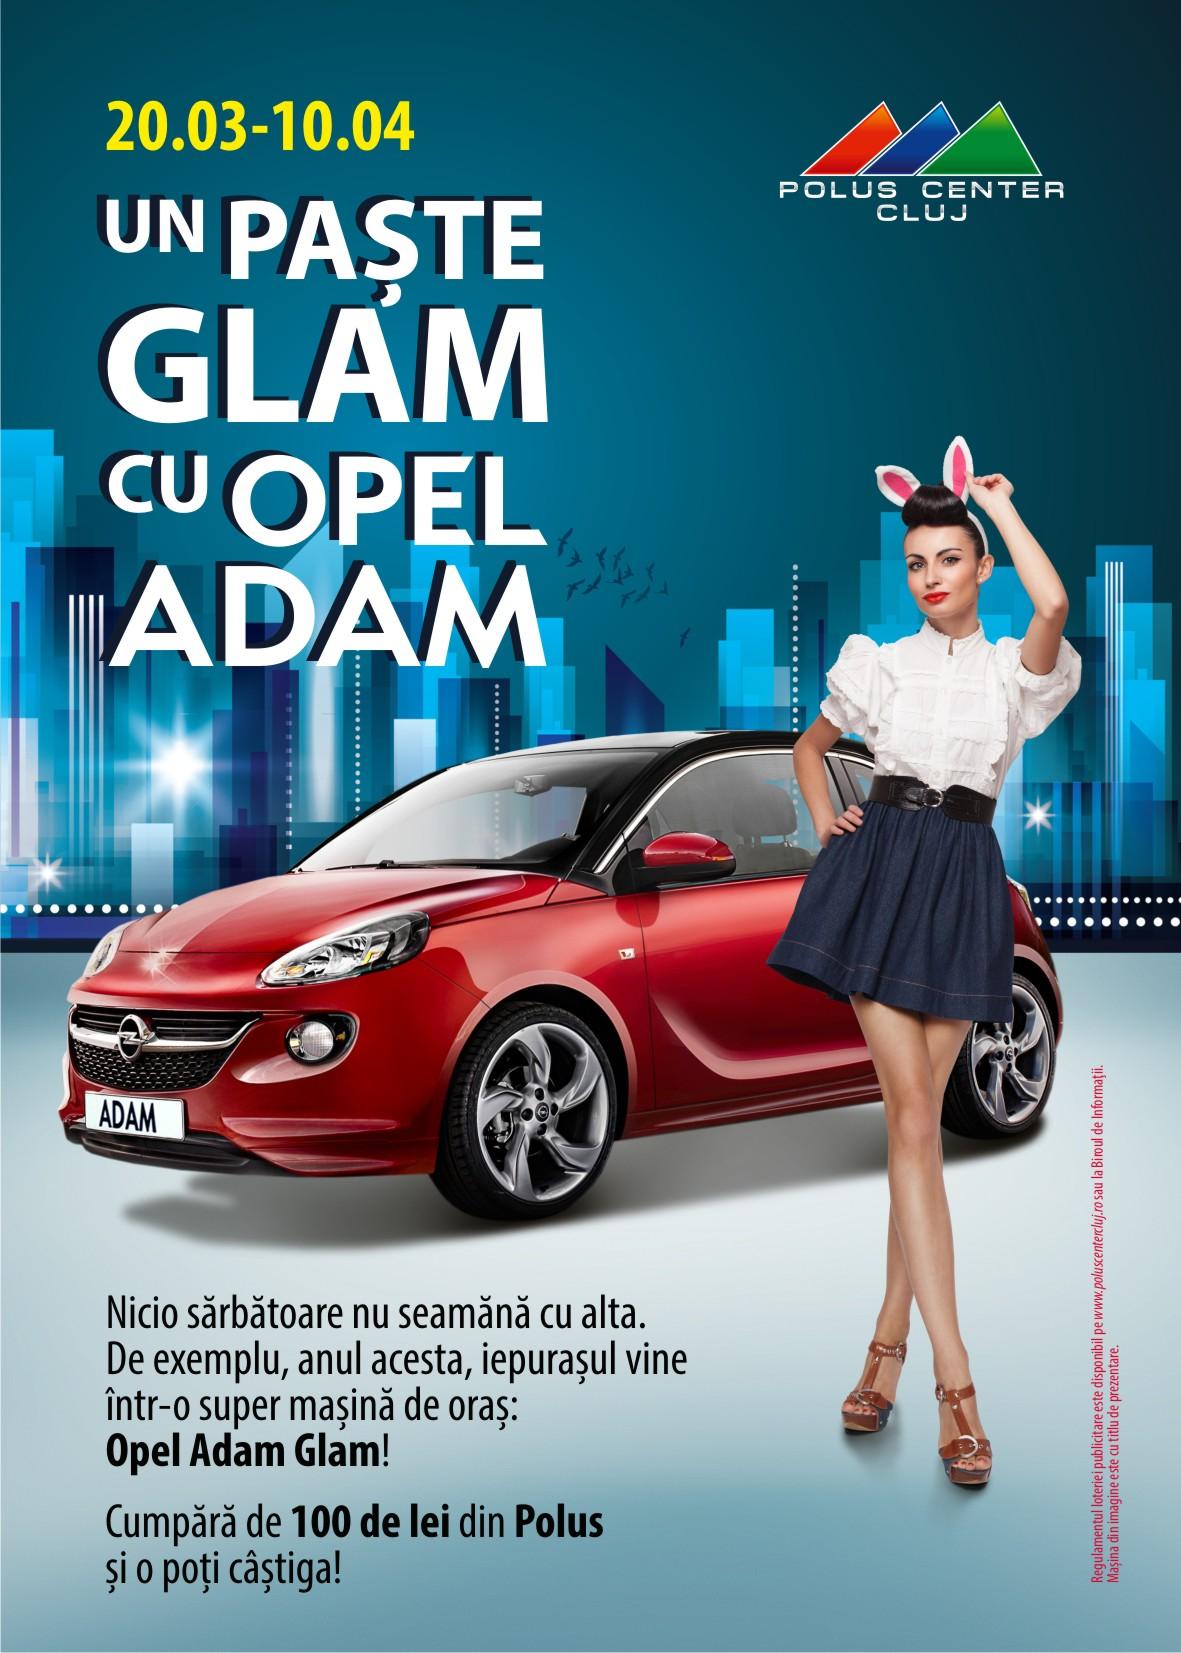 Un Paște Glam cu Opel Adam la Polus